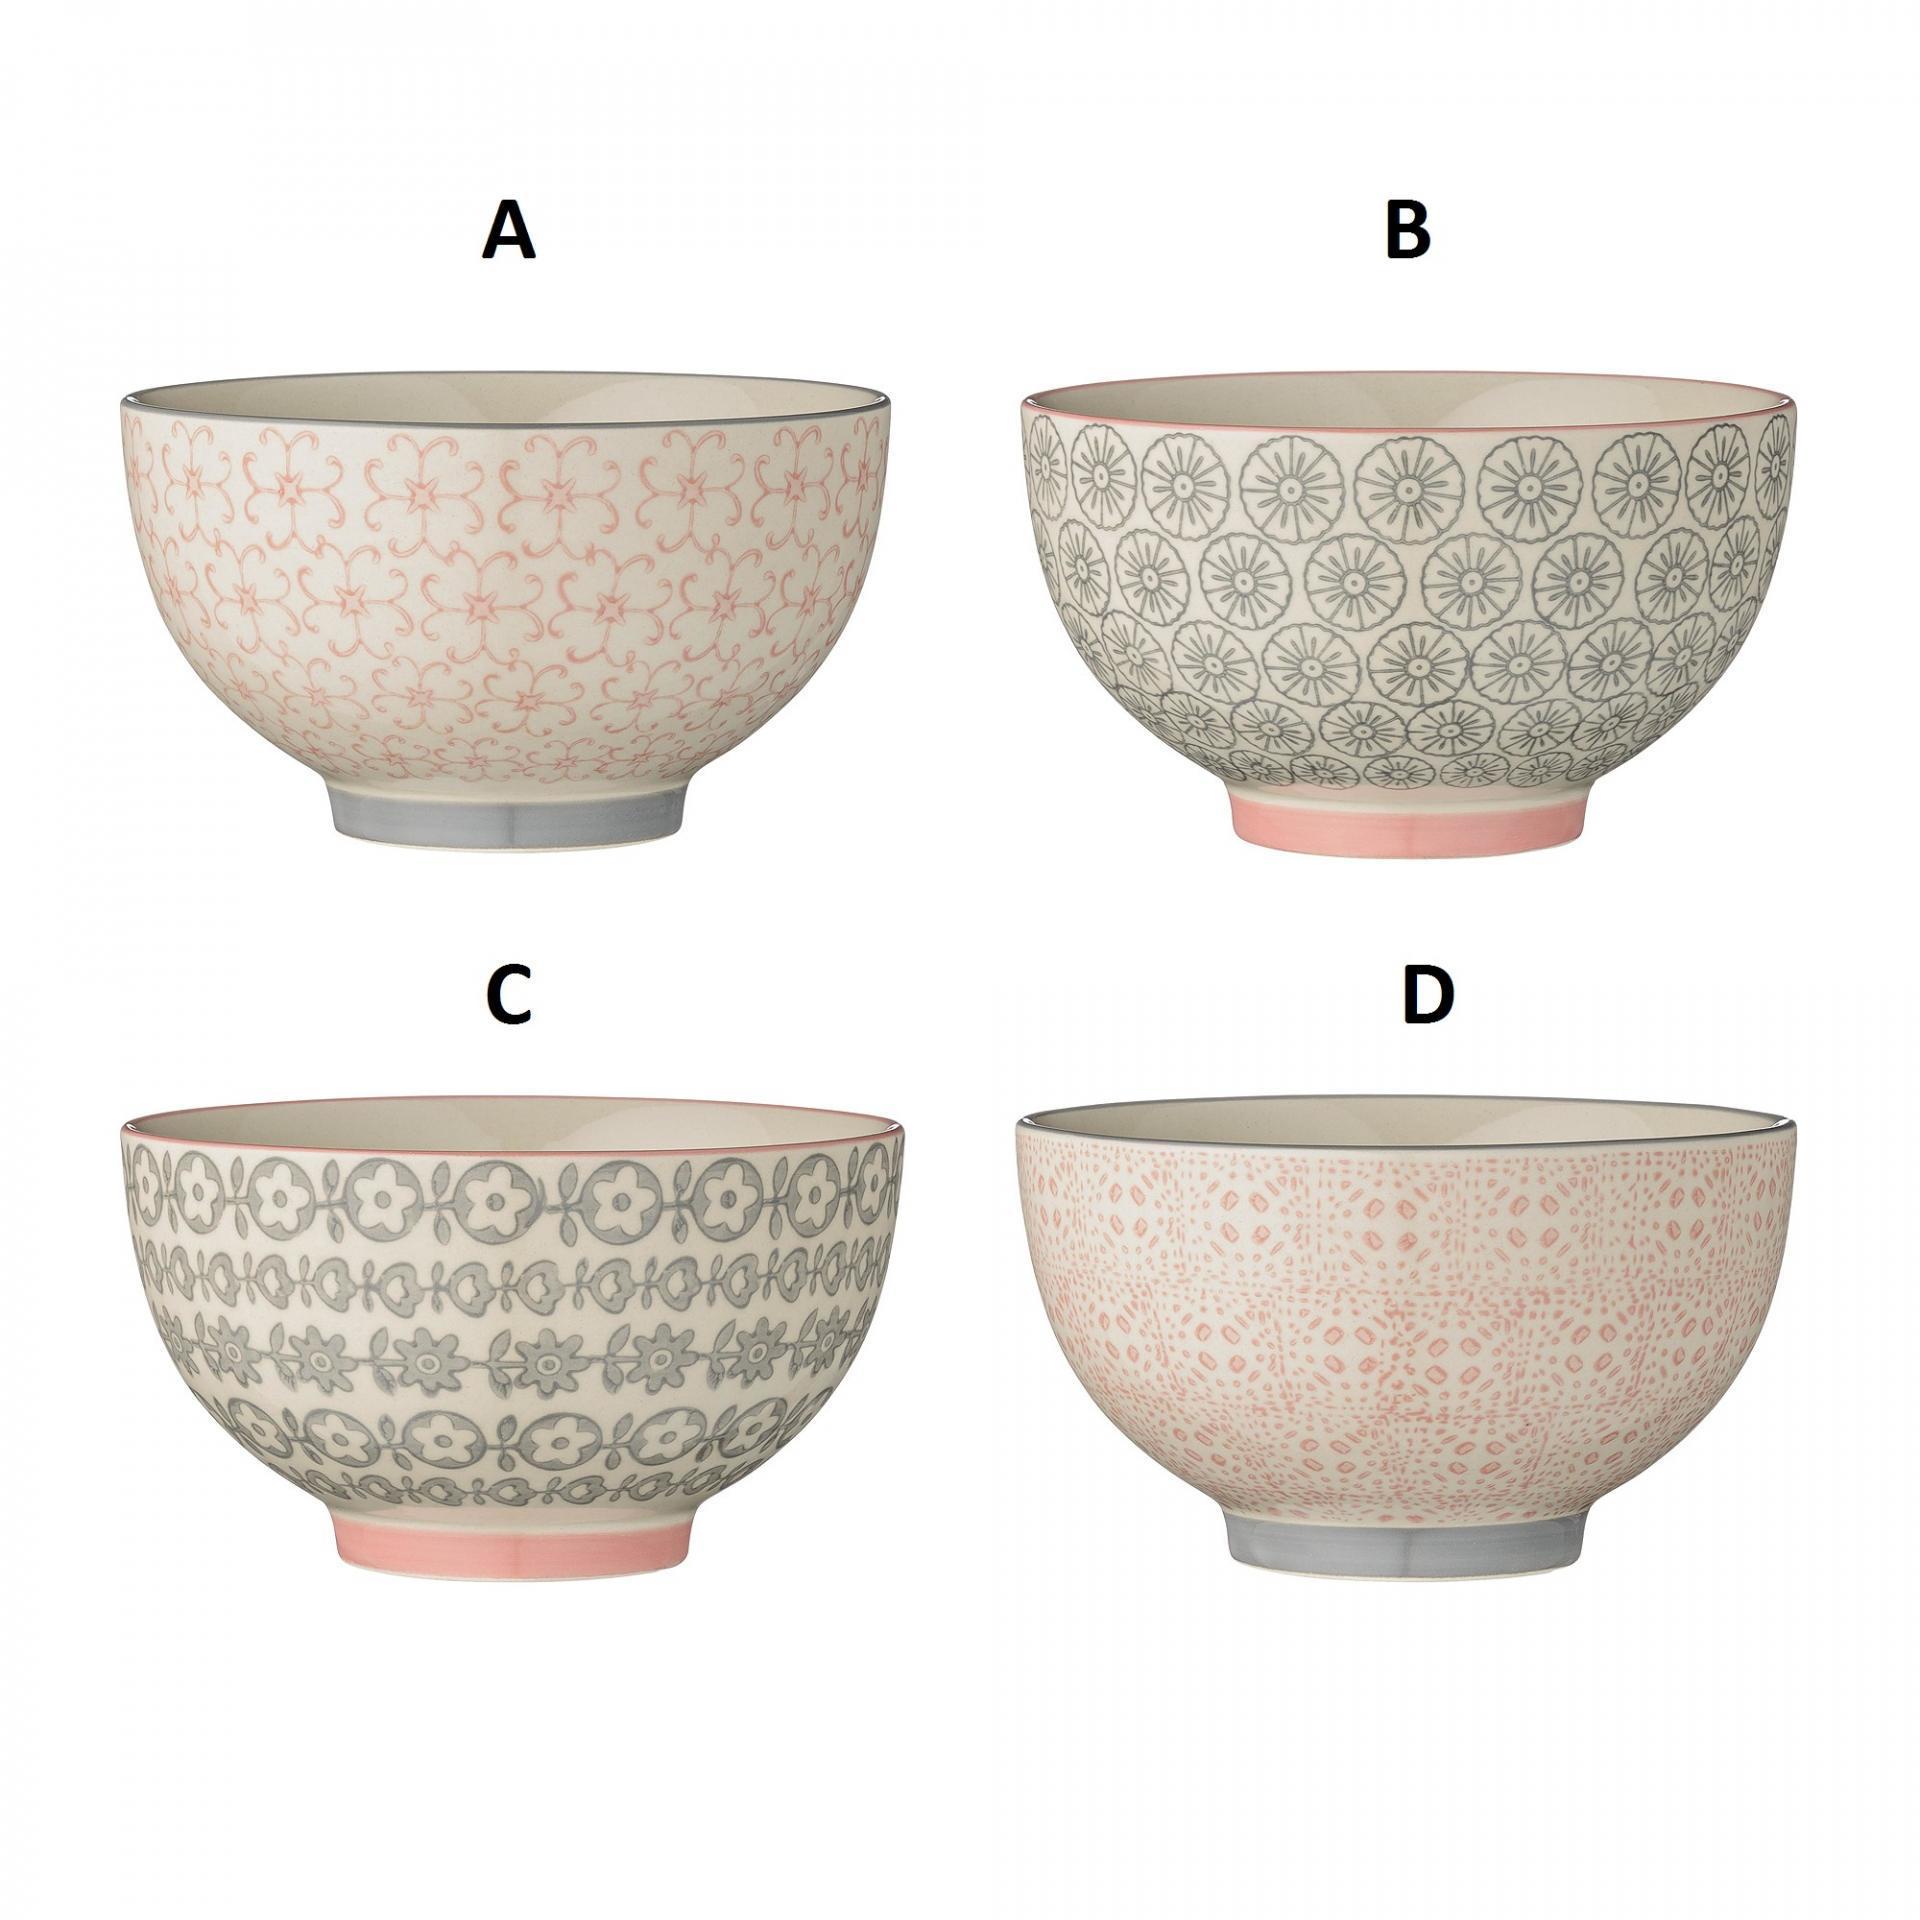 Bloomingville Keramická miska Cécile Motiv A, růžová barva, šedá barva, keramika